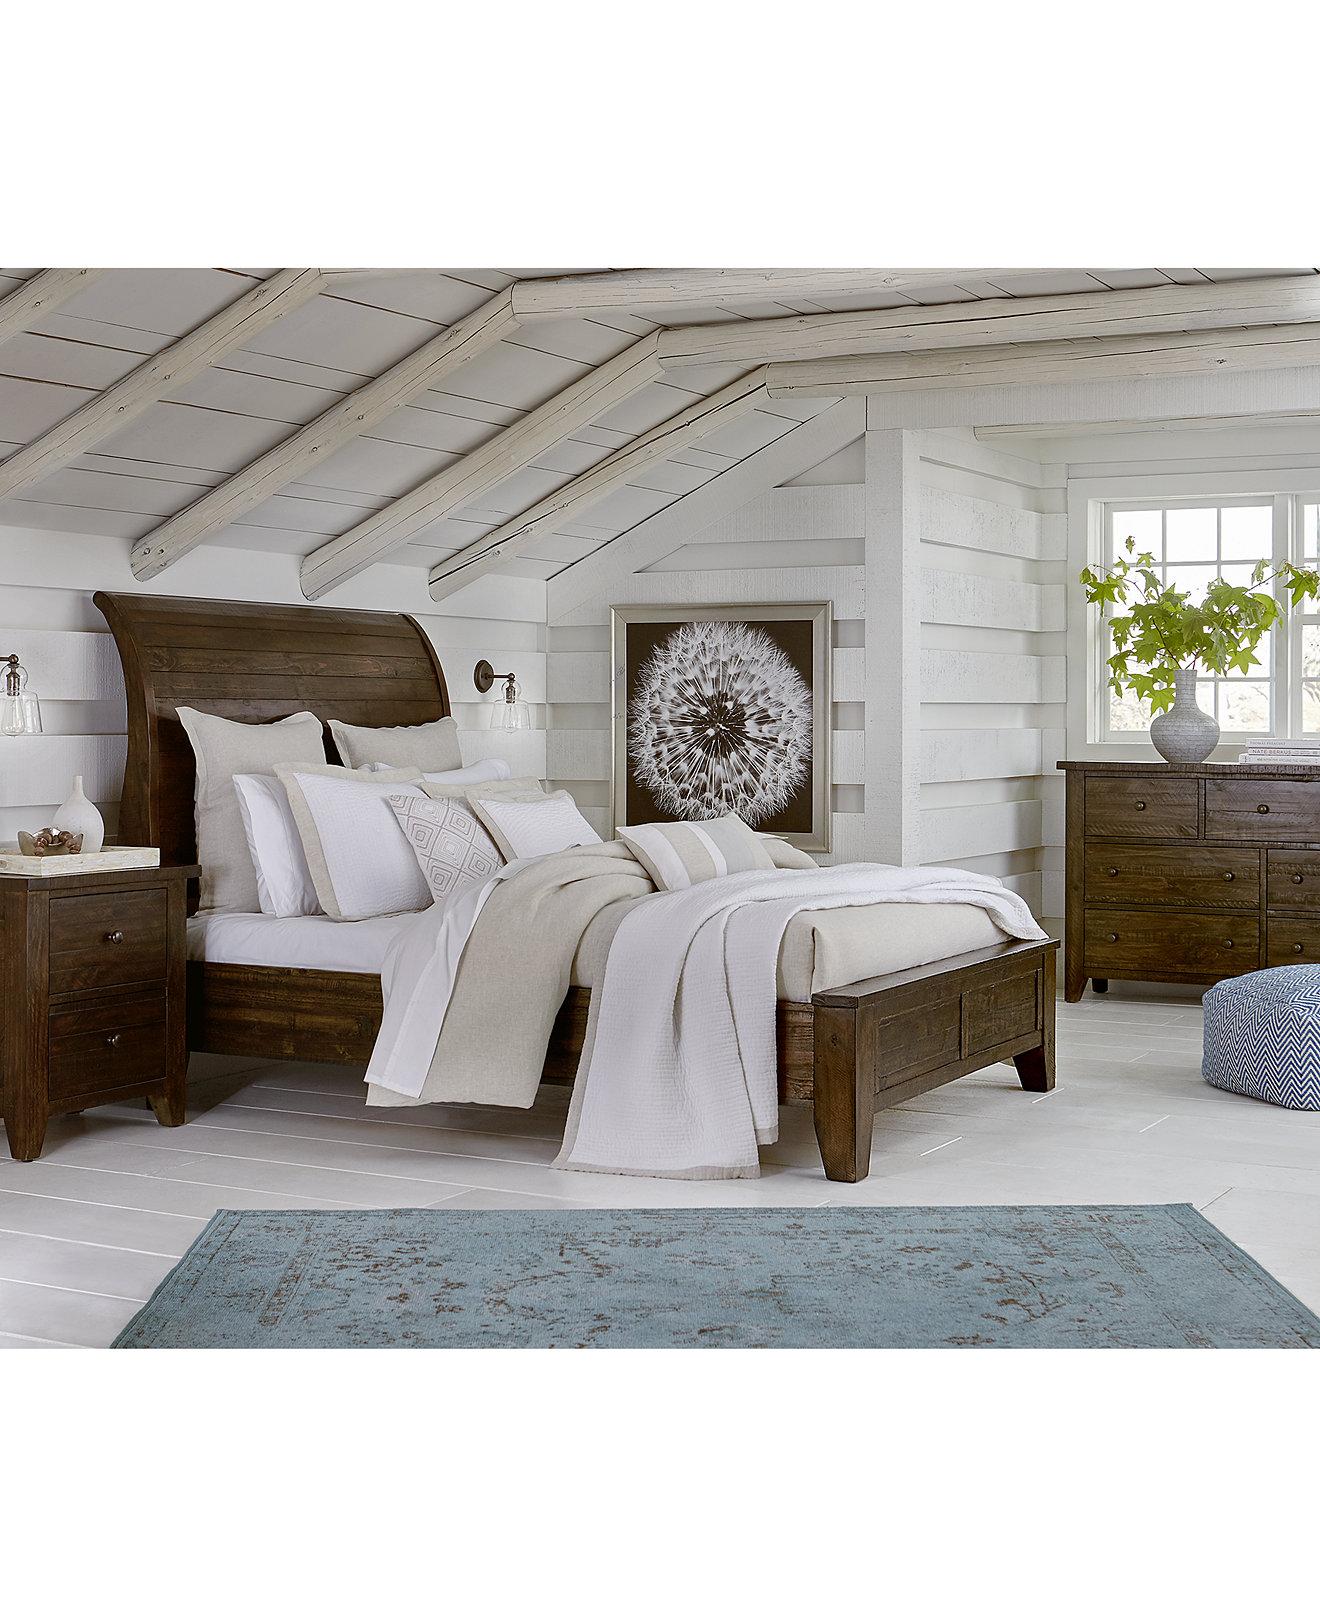 Macys Bedroom Furniture Rustic Rustic Macys